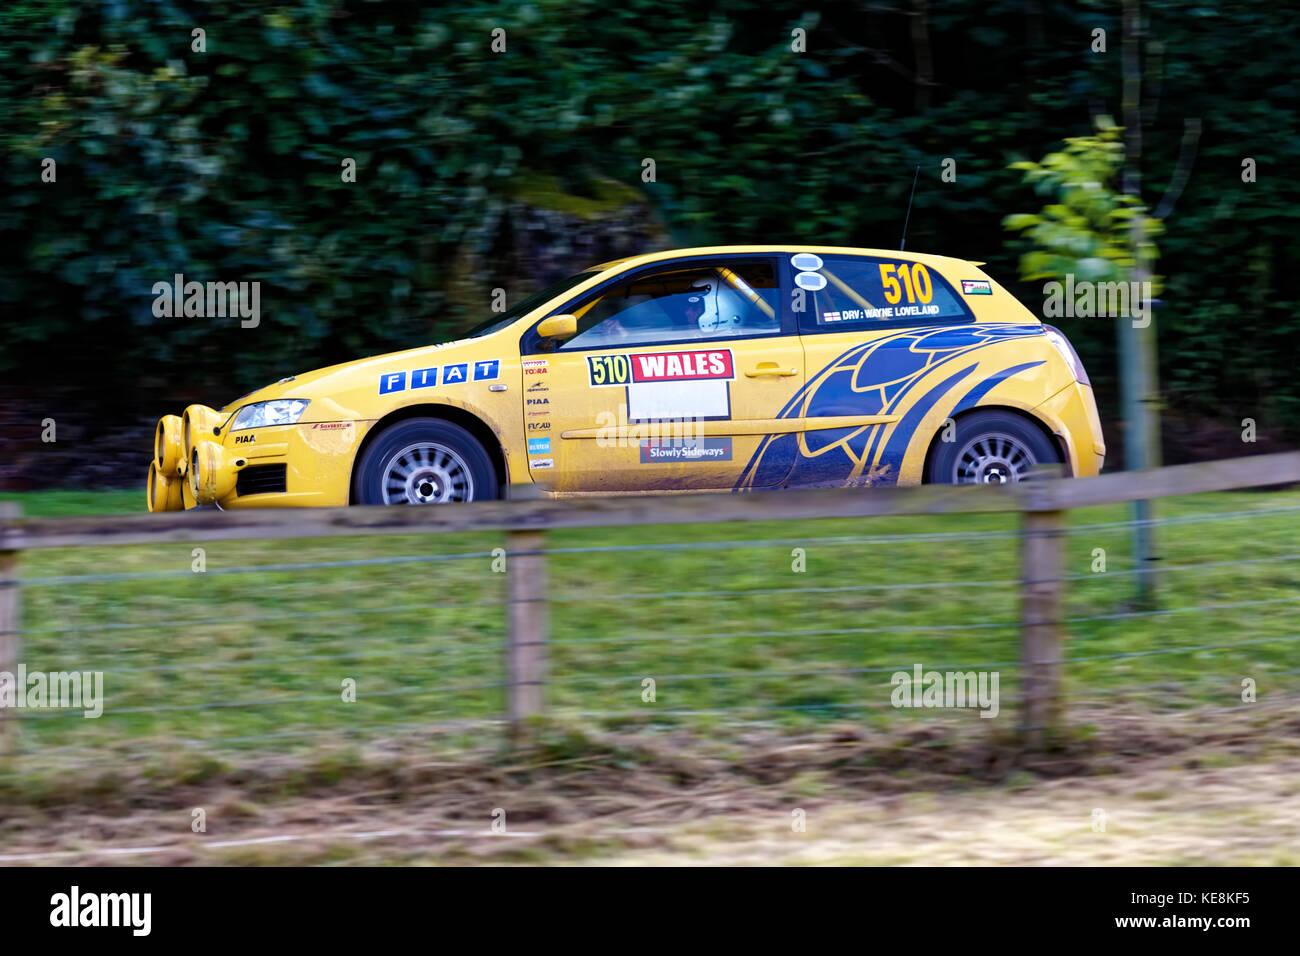 Ein Fiat Stilo abarth Gruppe a Rally Car auf der Wilton classic & super Auto Tag, Wiltshire, 2014 Stockbild